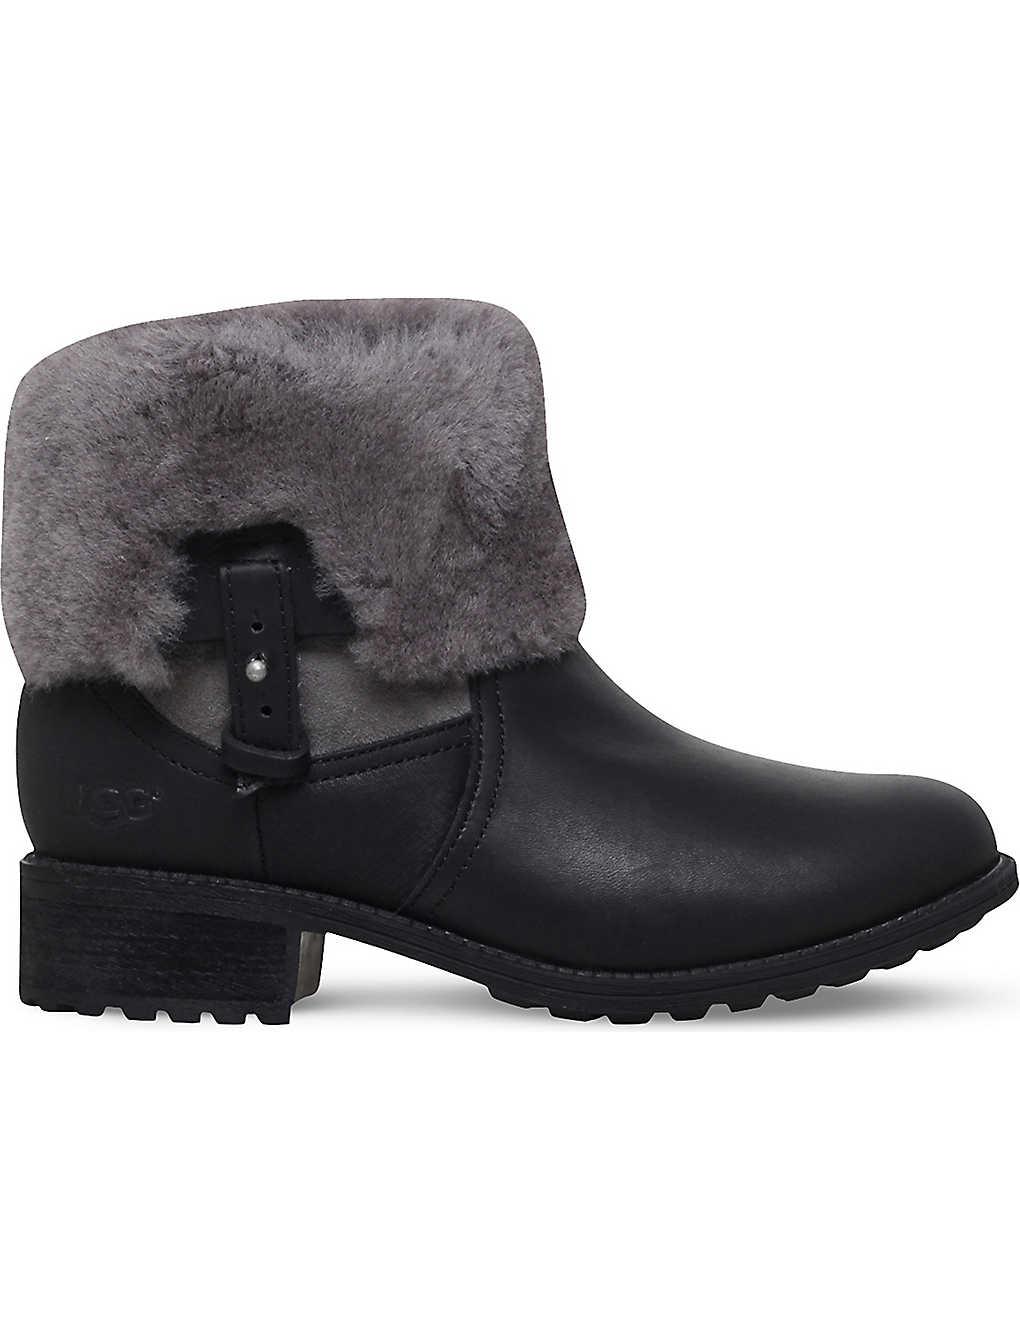 e3244c62fcd UGG - Chyler leather and sheepkin boots | Selfridges.com